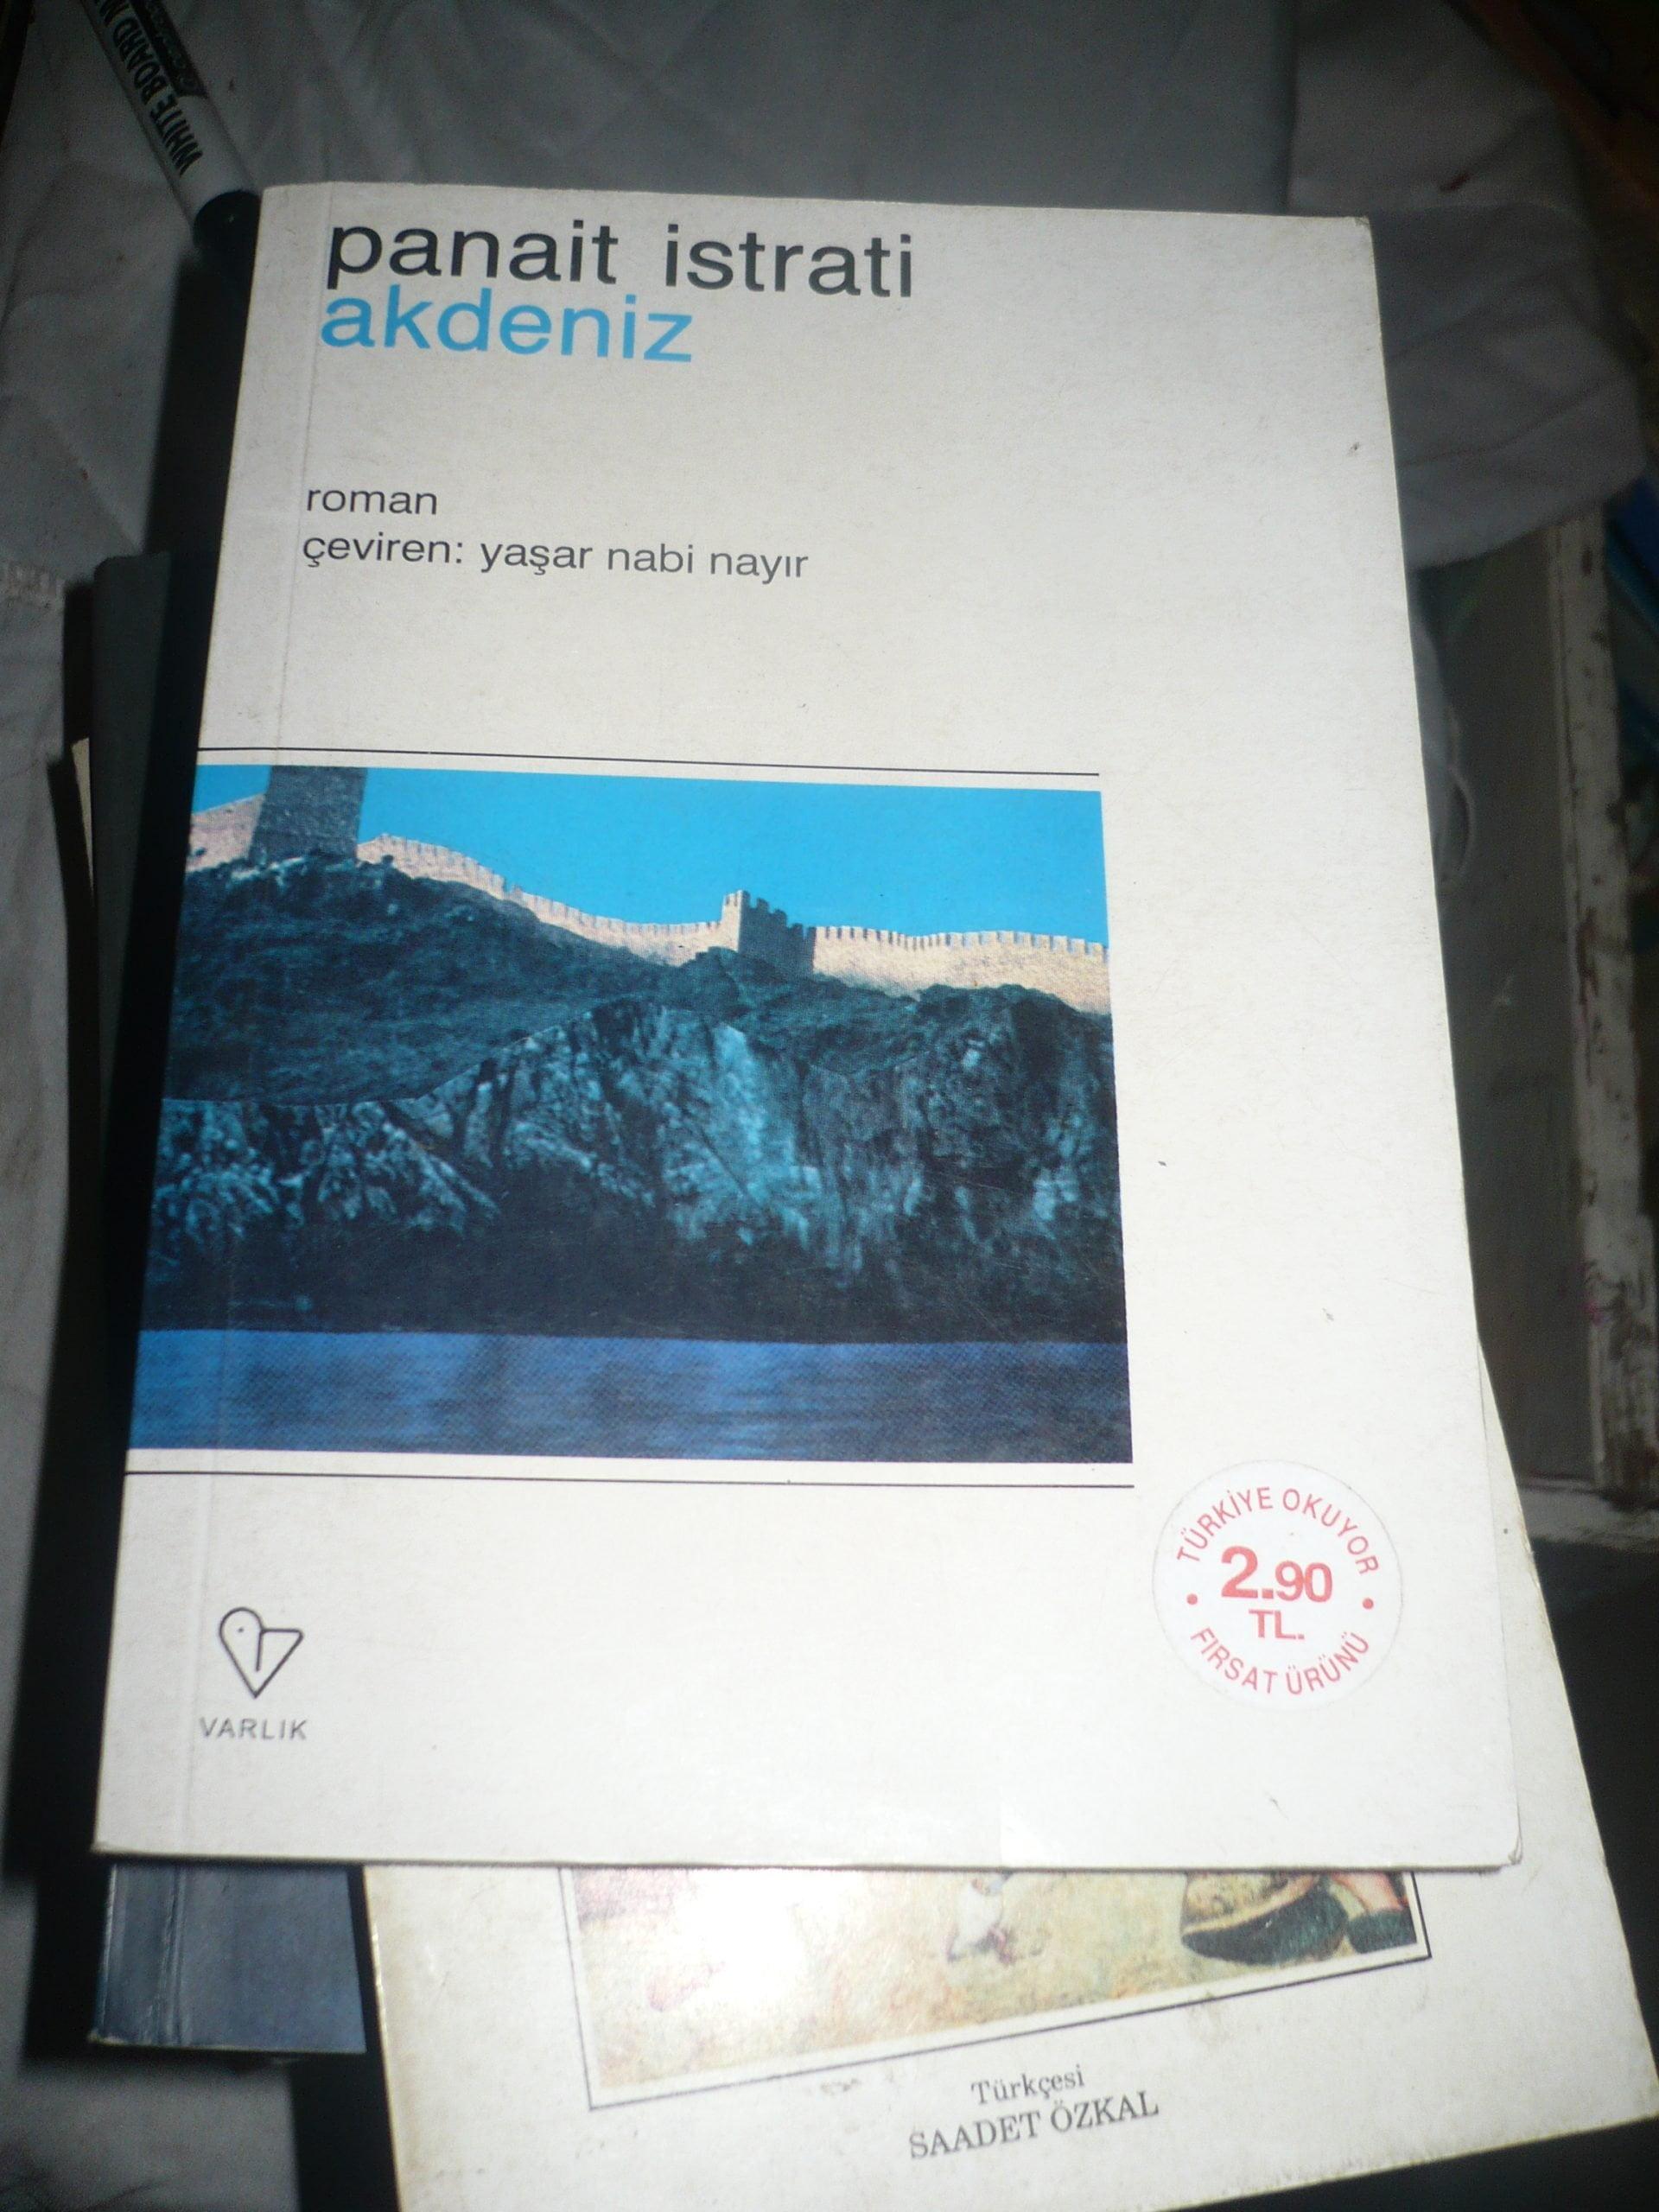 AKDENİZ/Panait İstrati/Varlık yay/ 10 tl